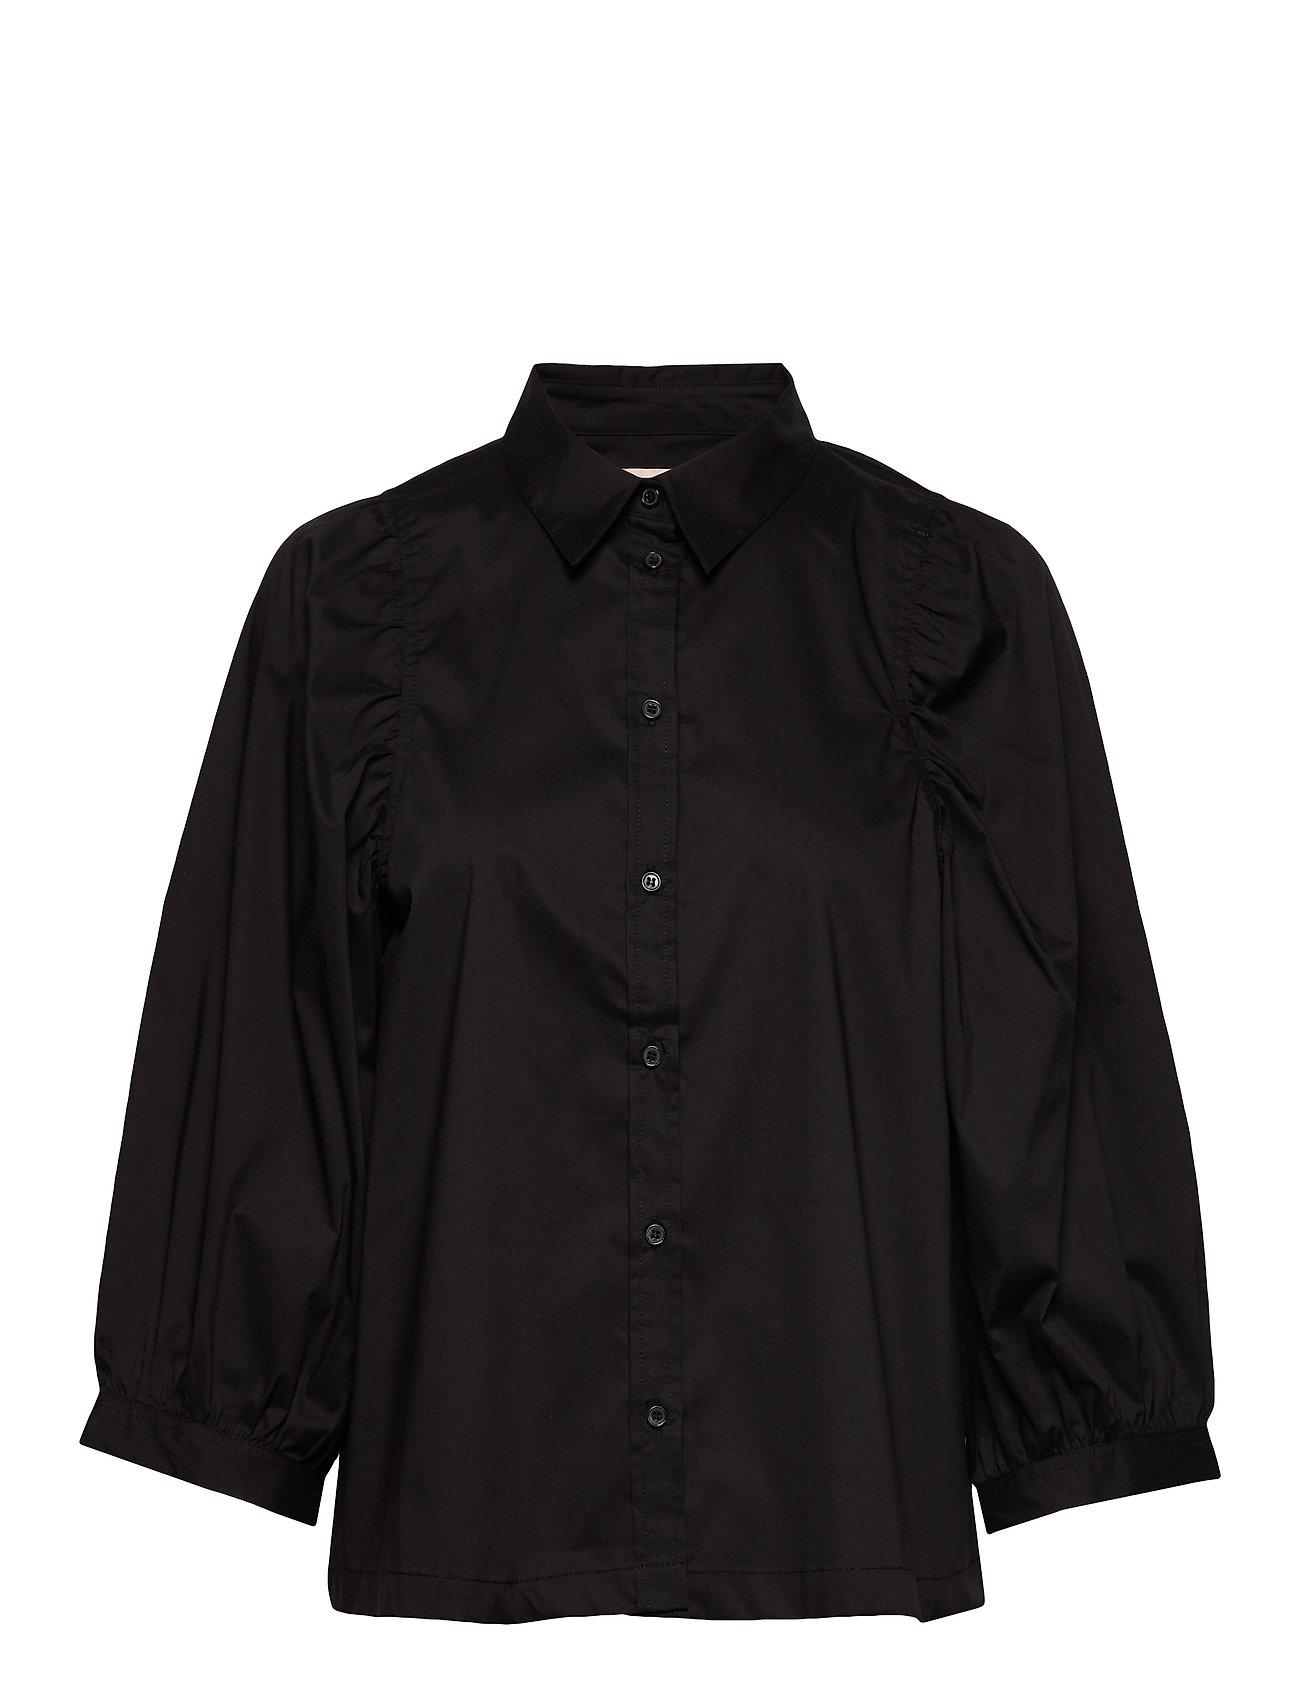 Soft Rebels Joanne 3/4 Shirt - BLACK